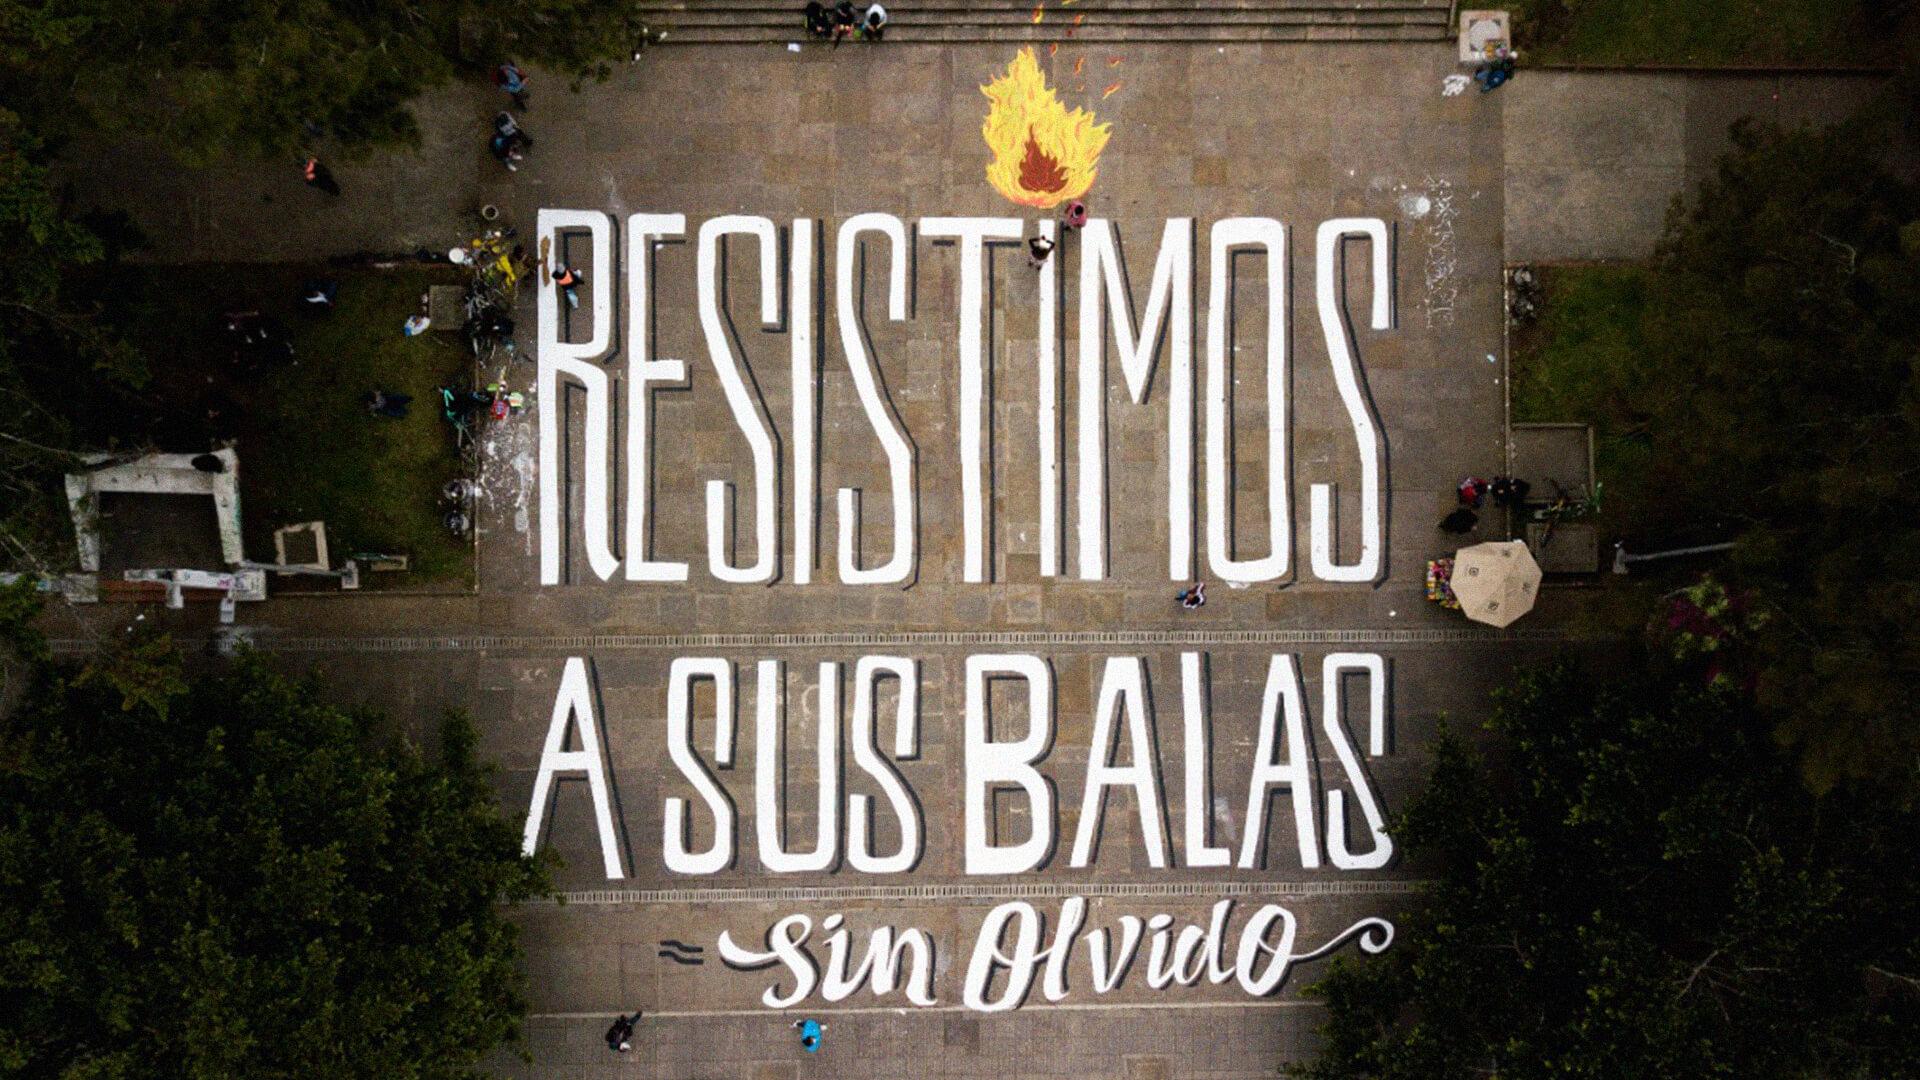 PACIFISTA! presenta: Resistimos a sus balas